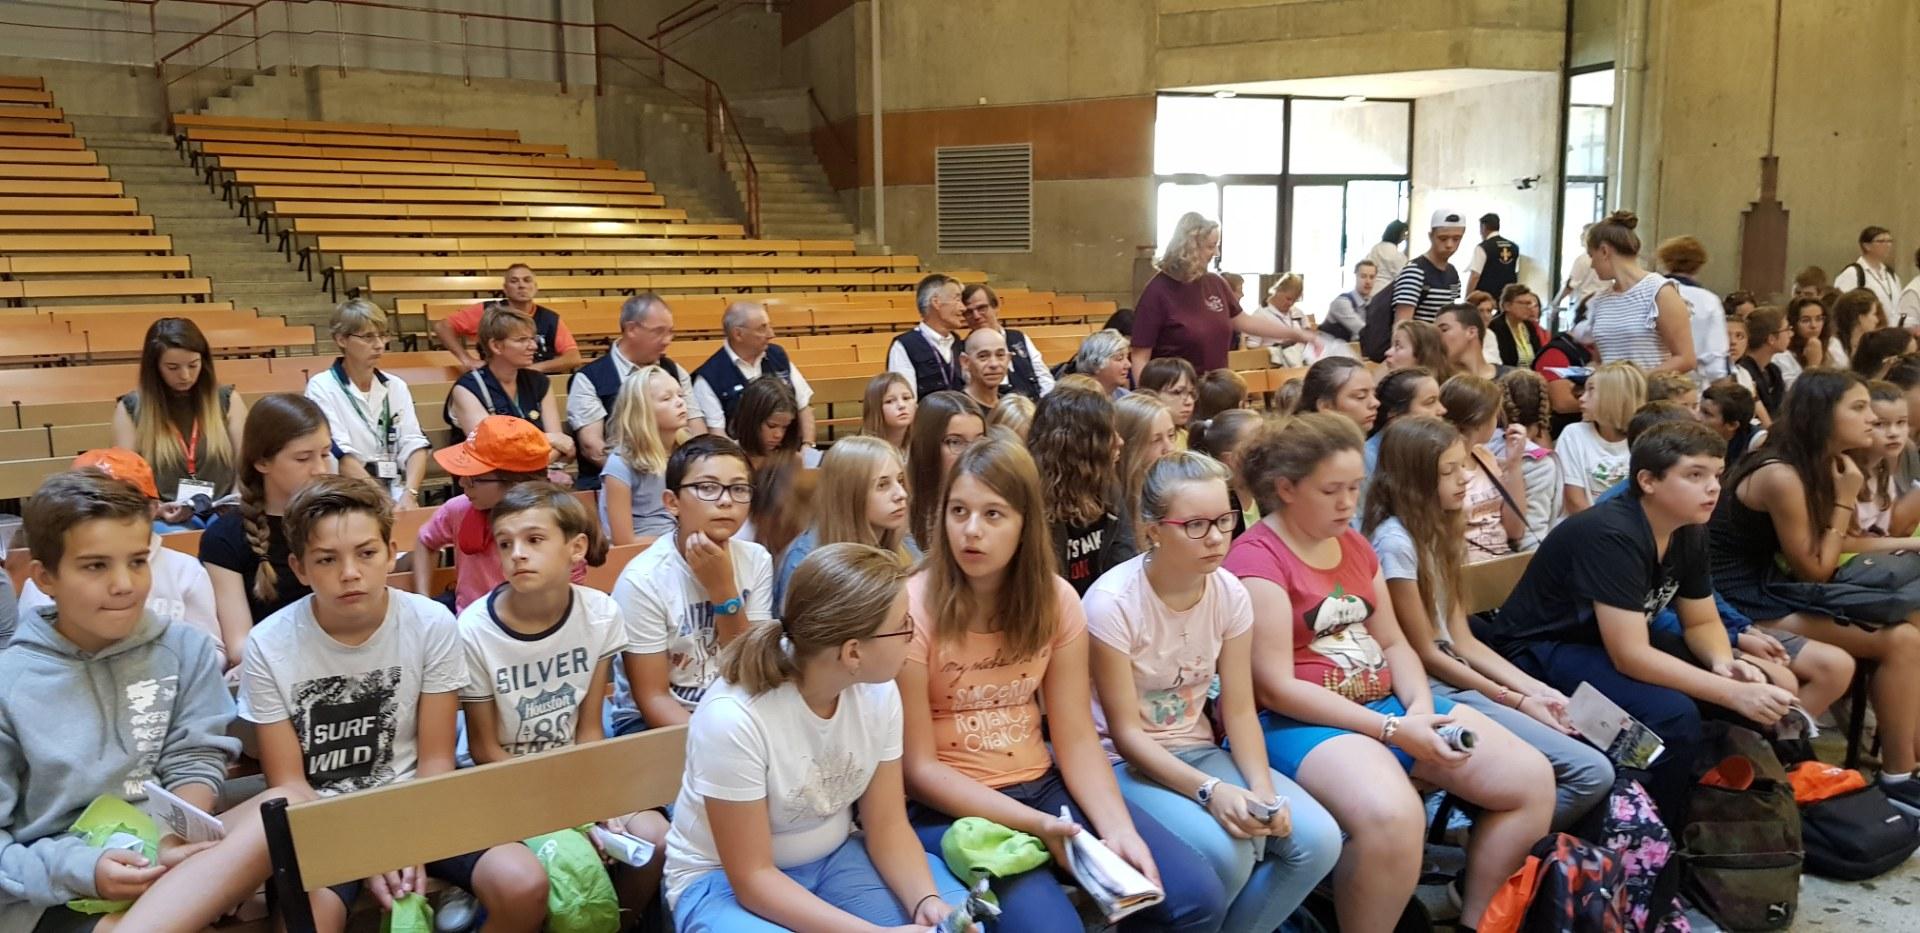 Lourdes 2018 - photos onction malades (1)